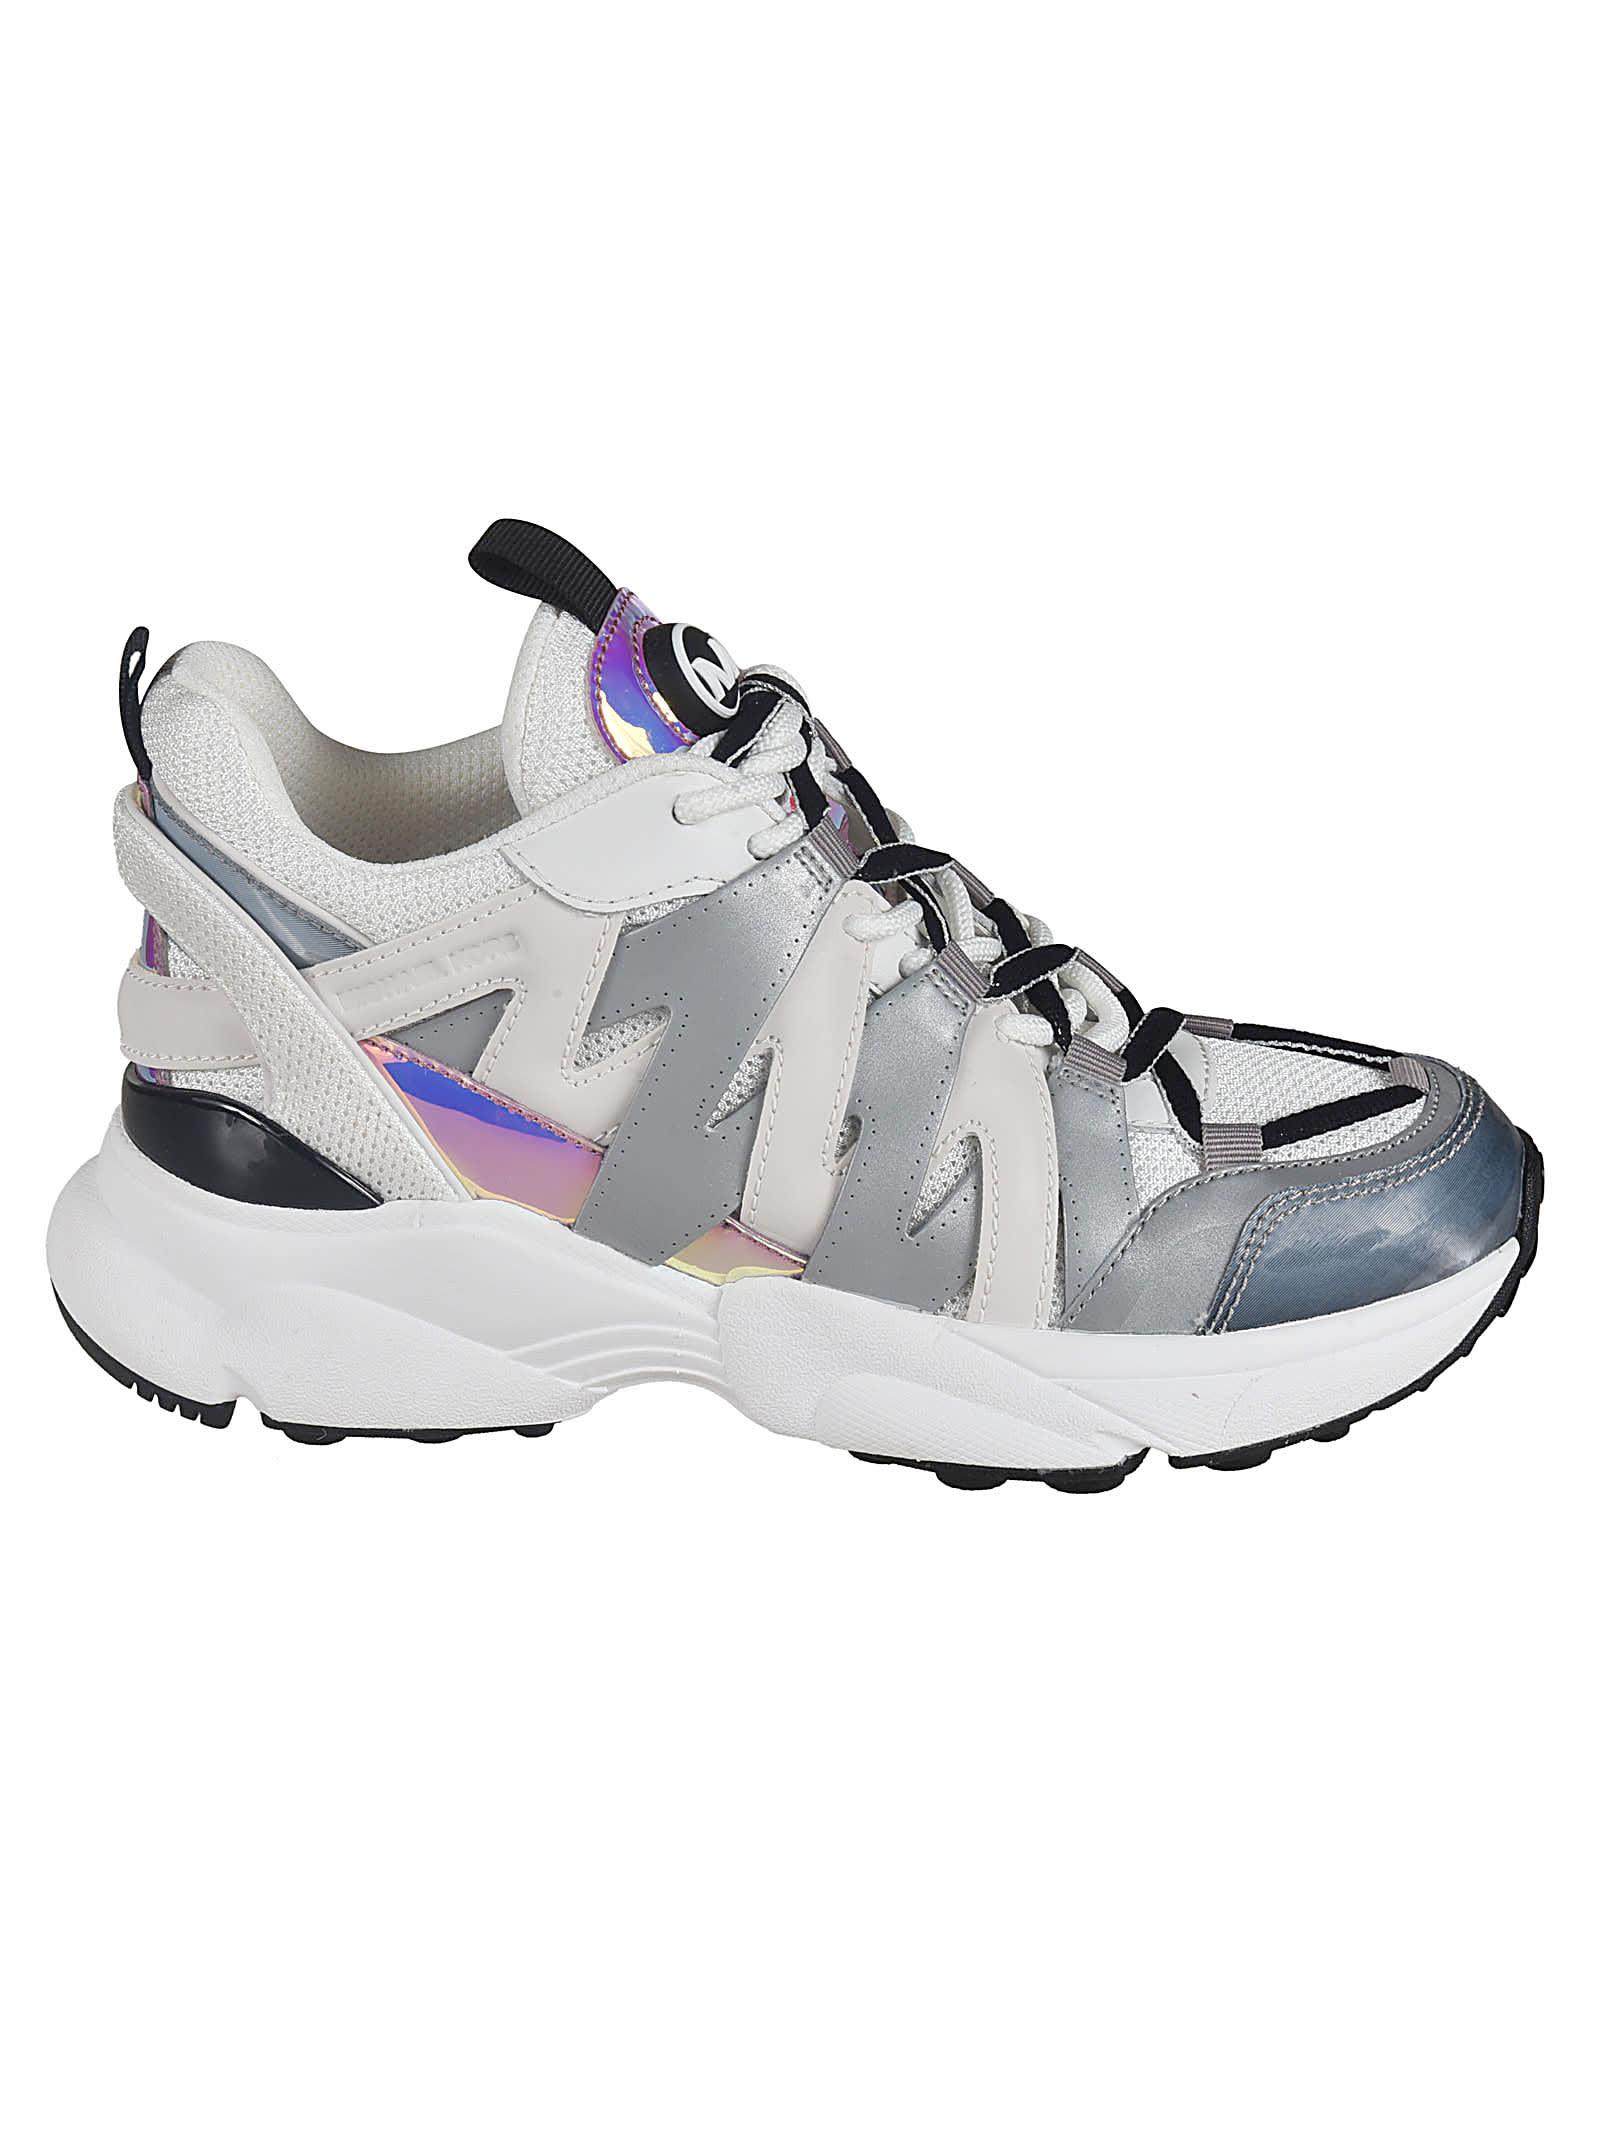 michael kors woven sneakers